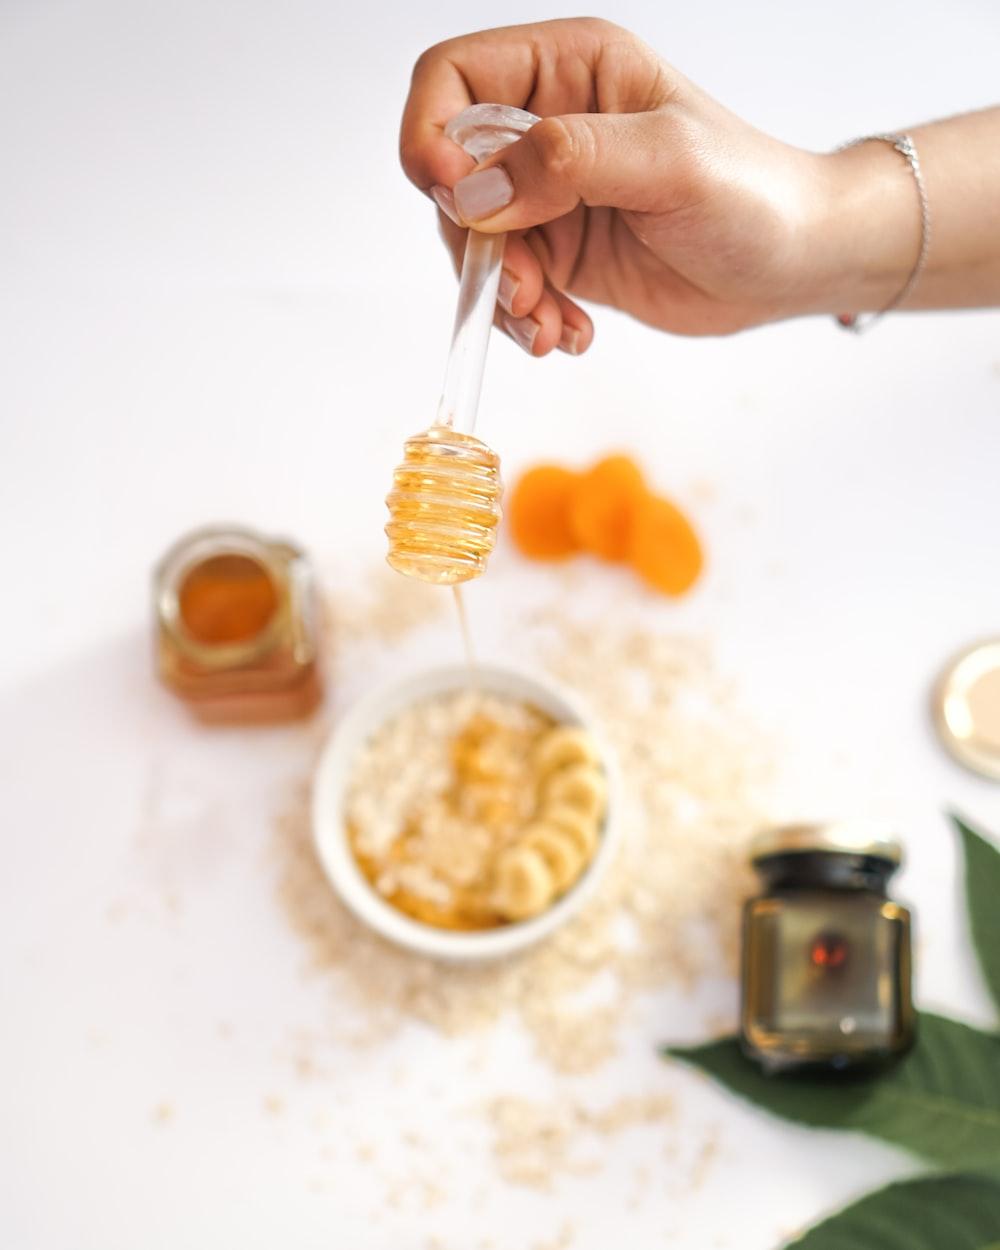 person holding honey ladle